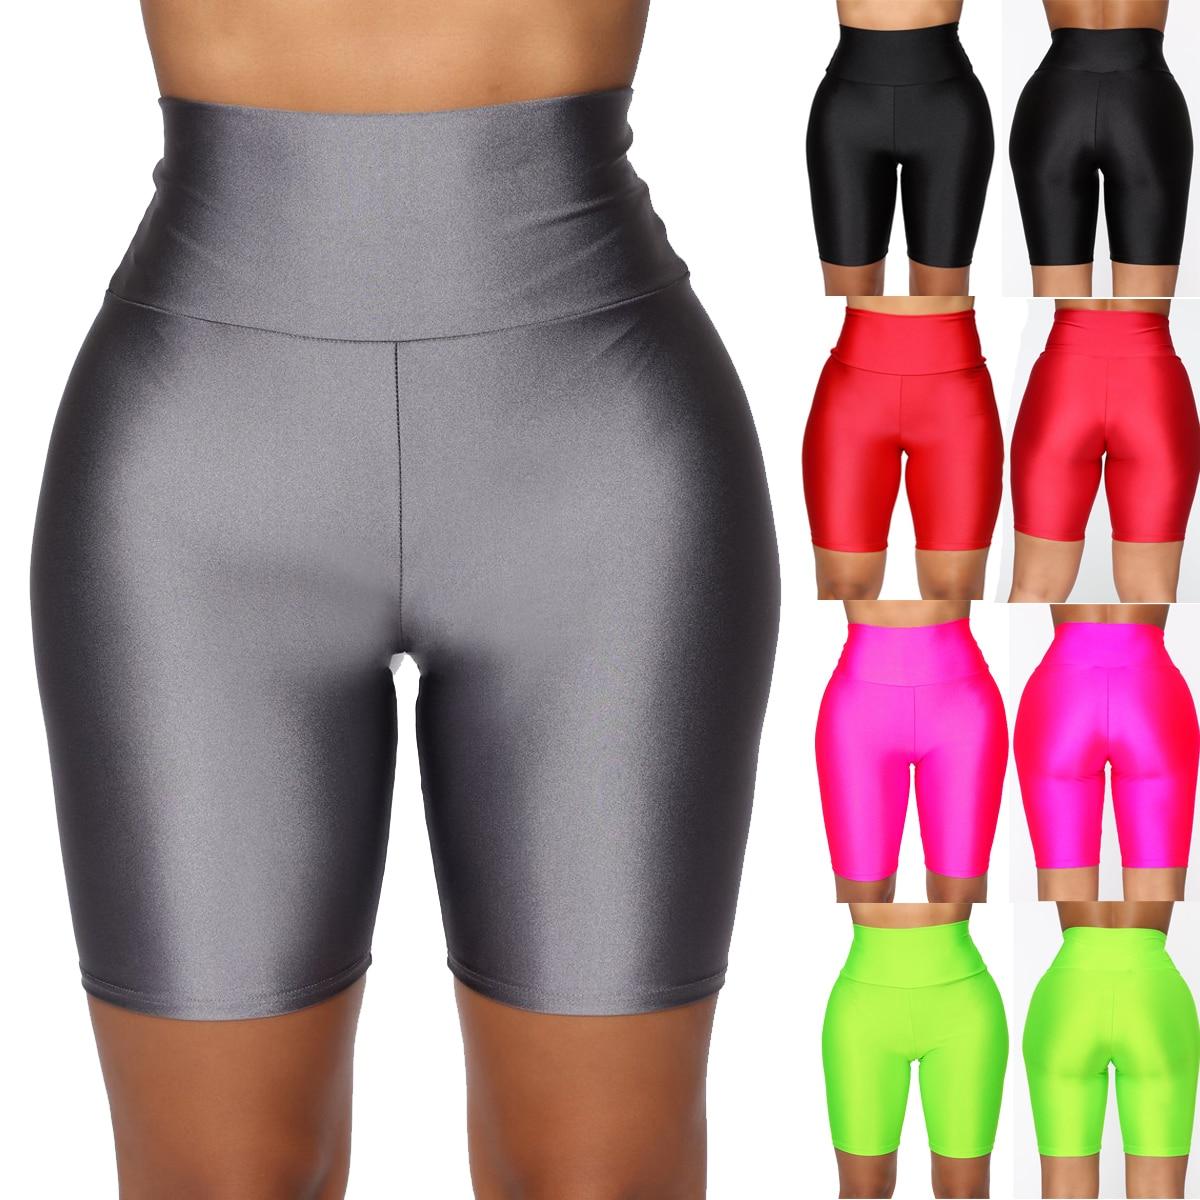 Hirigin גבוהה מותן ניאון נשים מכנסי יוגה אימון כושר אימון היפ אלסטי ספנדקס מכנסיים סקיני ריצת רכיבה על אופניים ספורטוויר